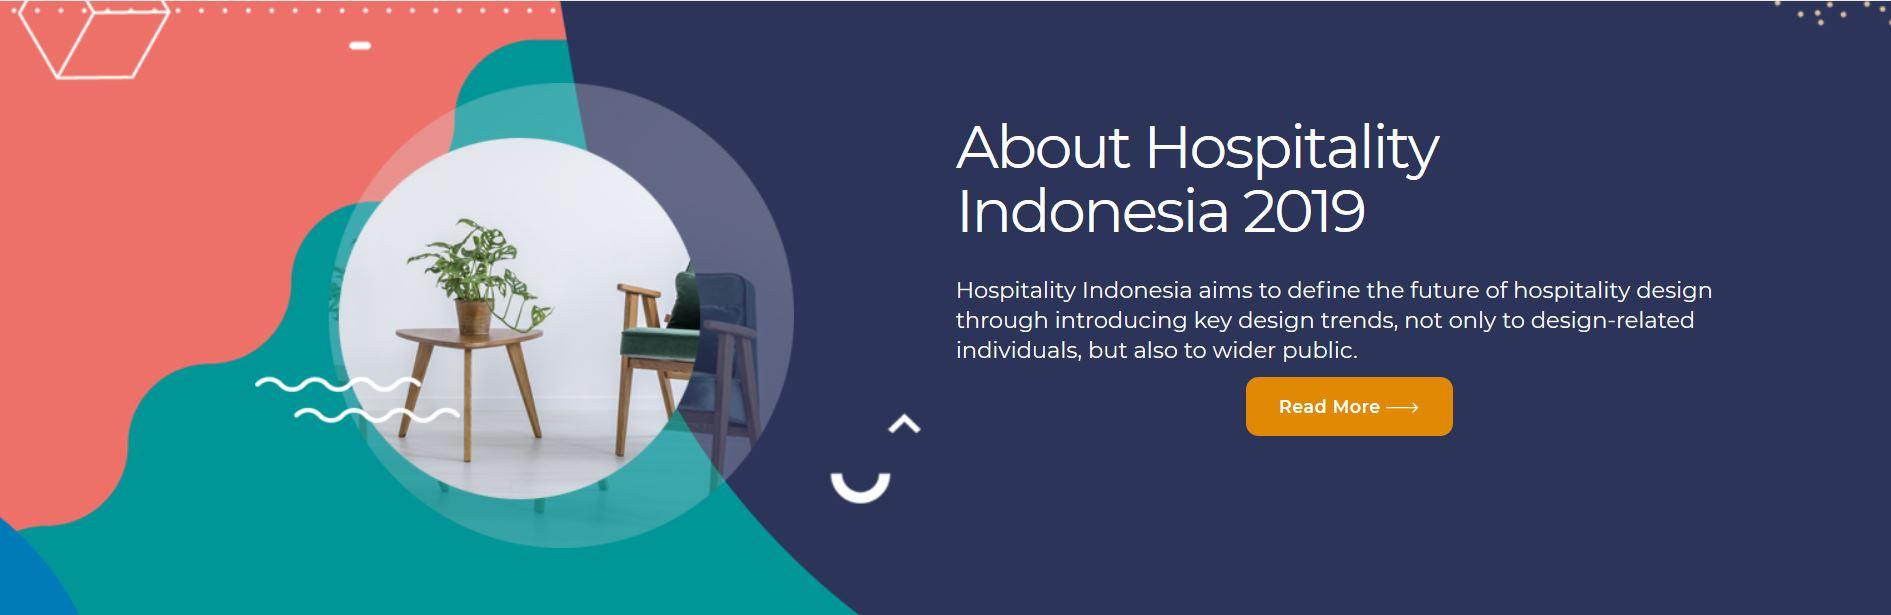 Tentang Hospitality Indonesia (Sumber: hospitality-indonesia.com/)